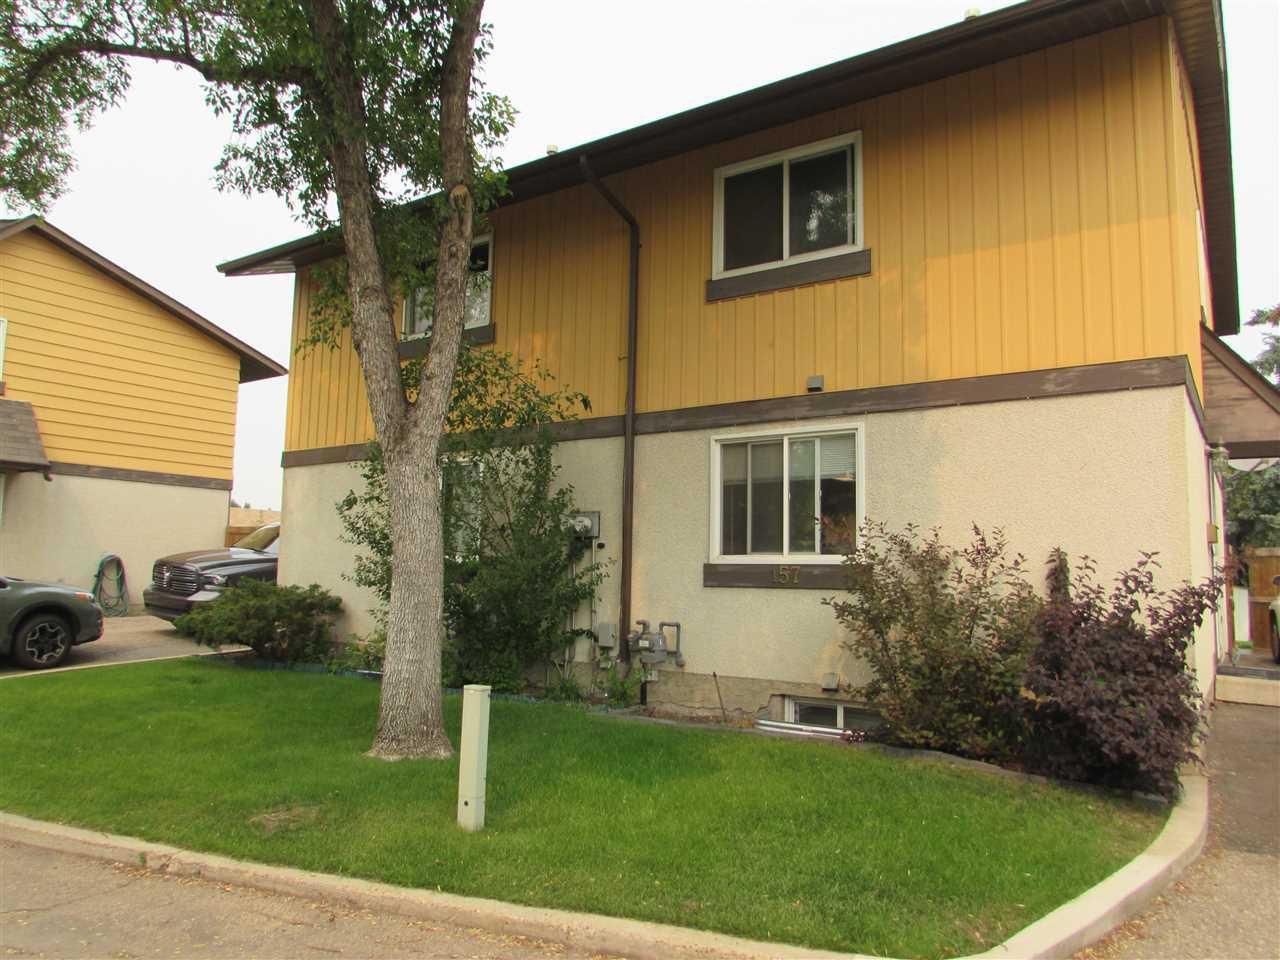 Main Photo: 157 Woodstock in Edmonton: Zone 20 Townhouse for sale : MLS®# E4139515